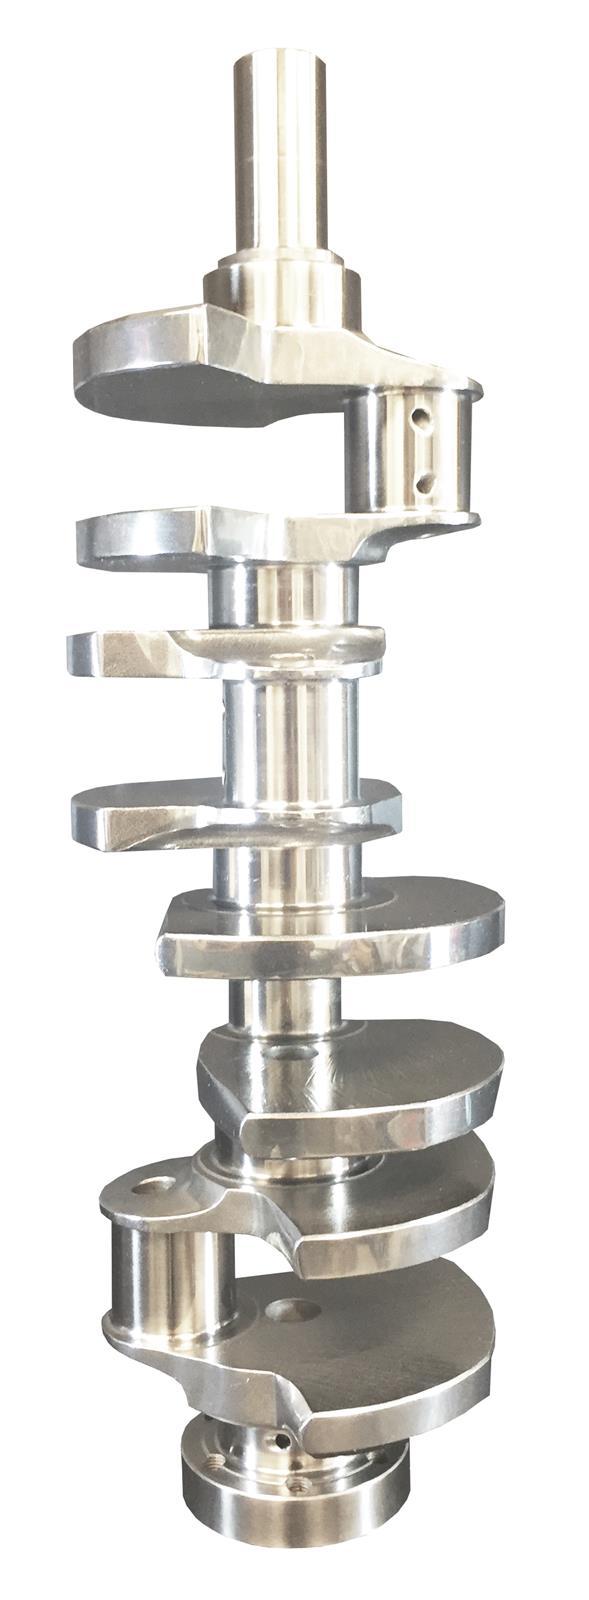 Dart GEN III Fully Counterweighted Crankshafts 9-34640006125-8